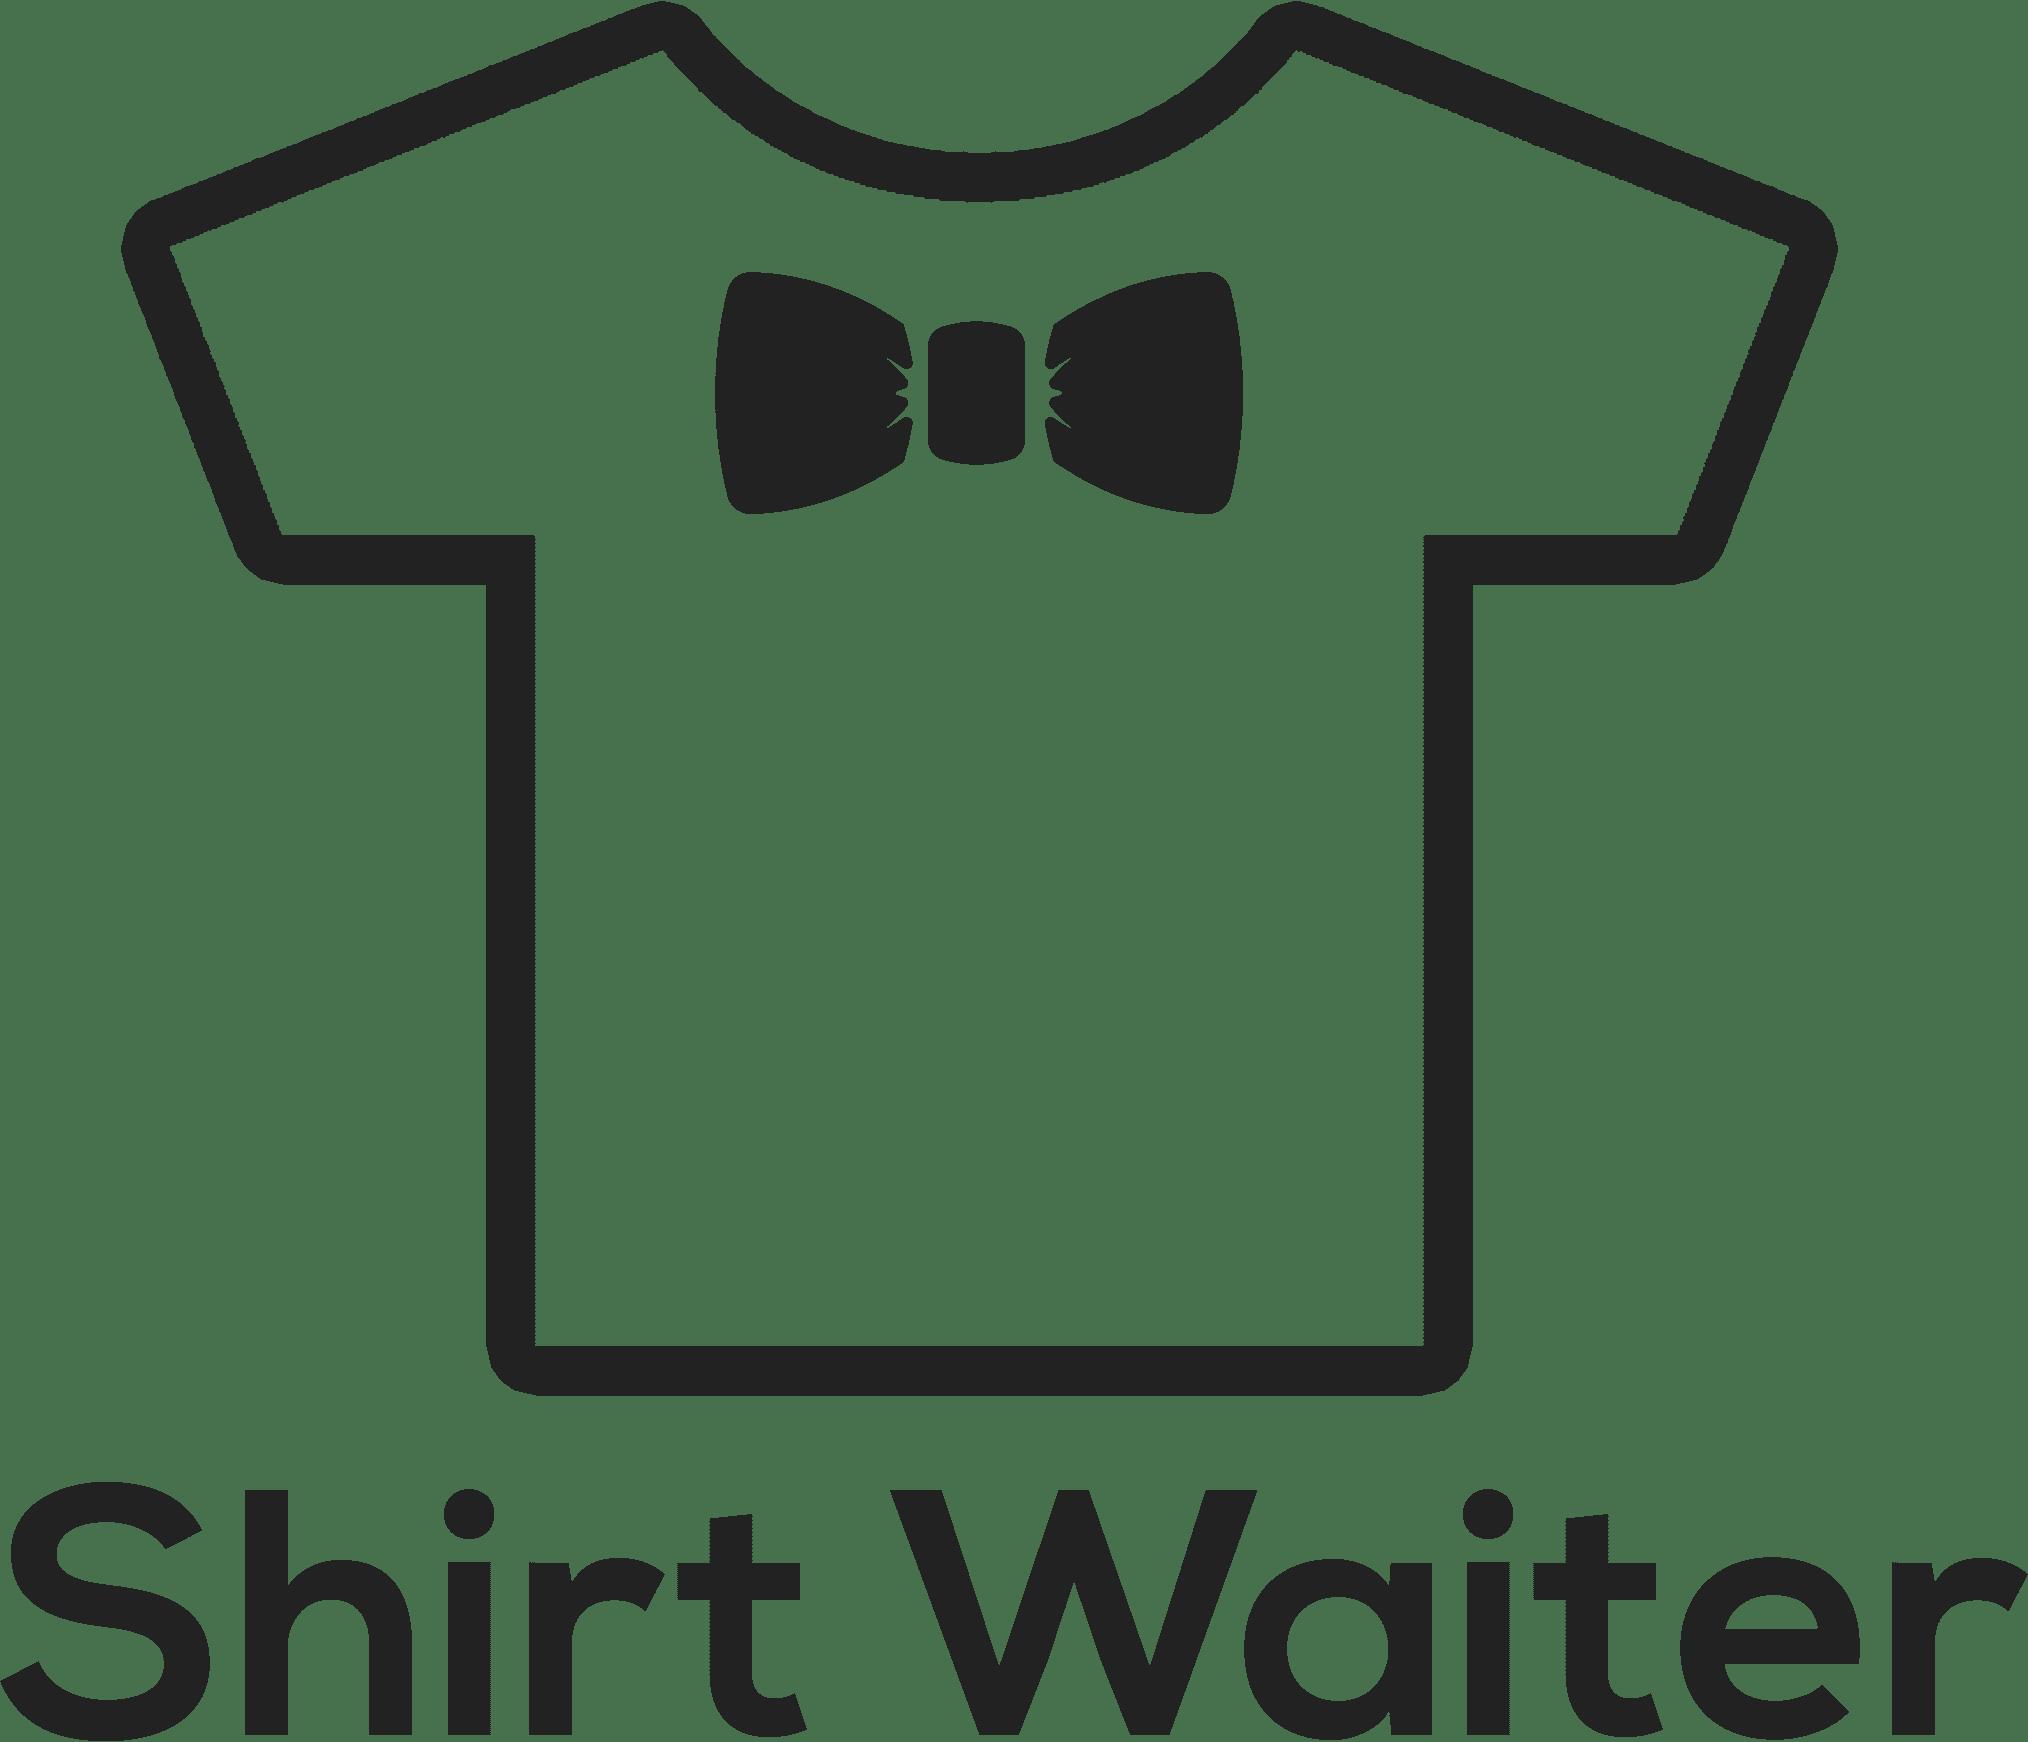 Shirt Waiter